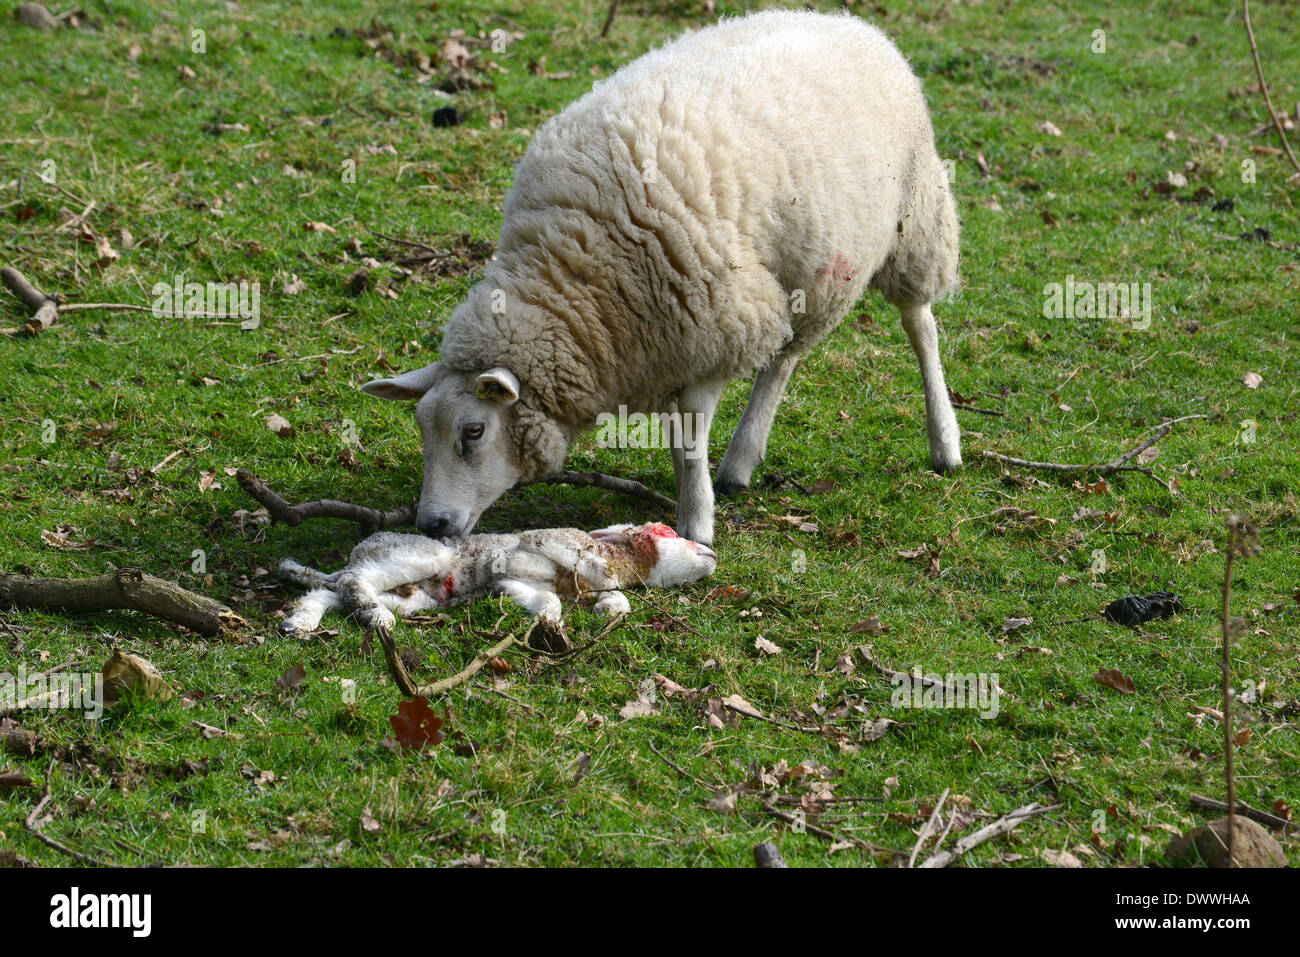 Female sheep ewe standing by her dead baby lamb uk - Stock Image